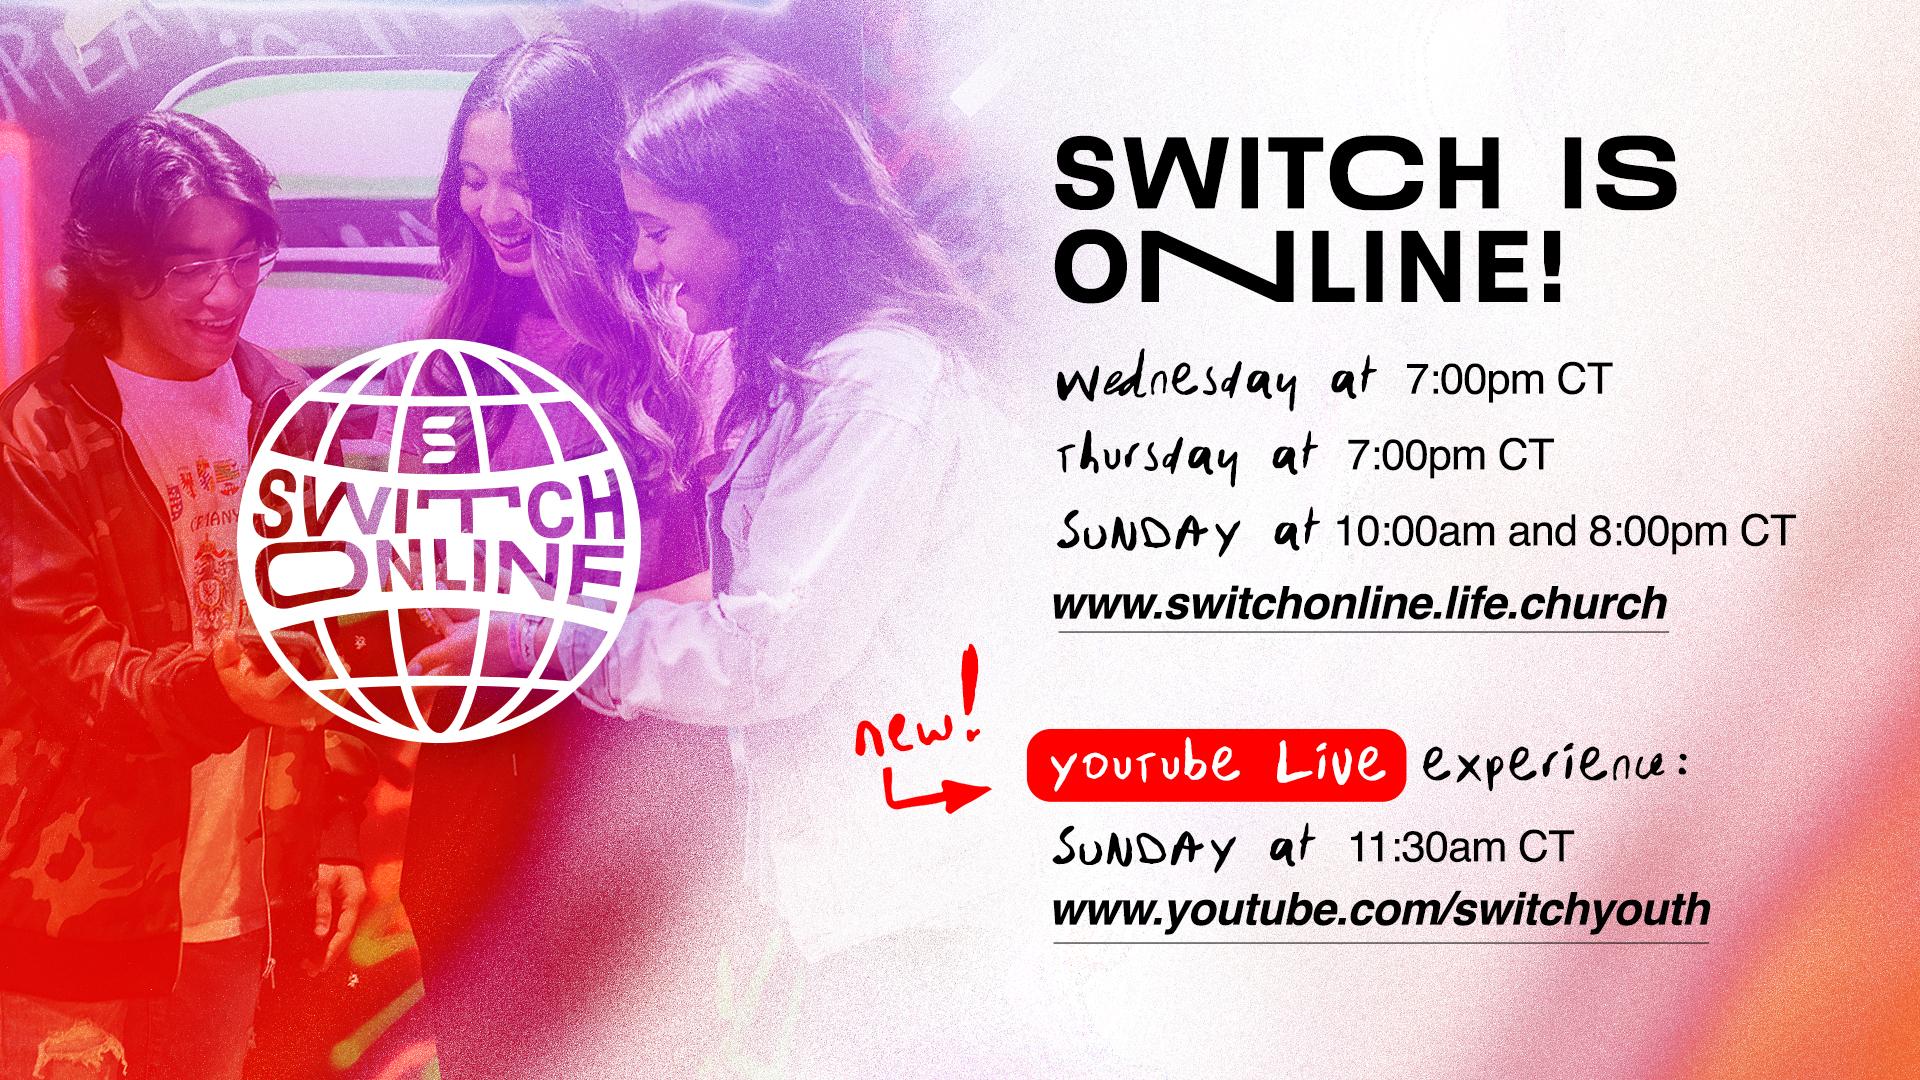 Switch Online Times 1080 - CT 2 (JPG)